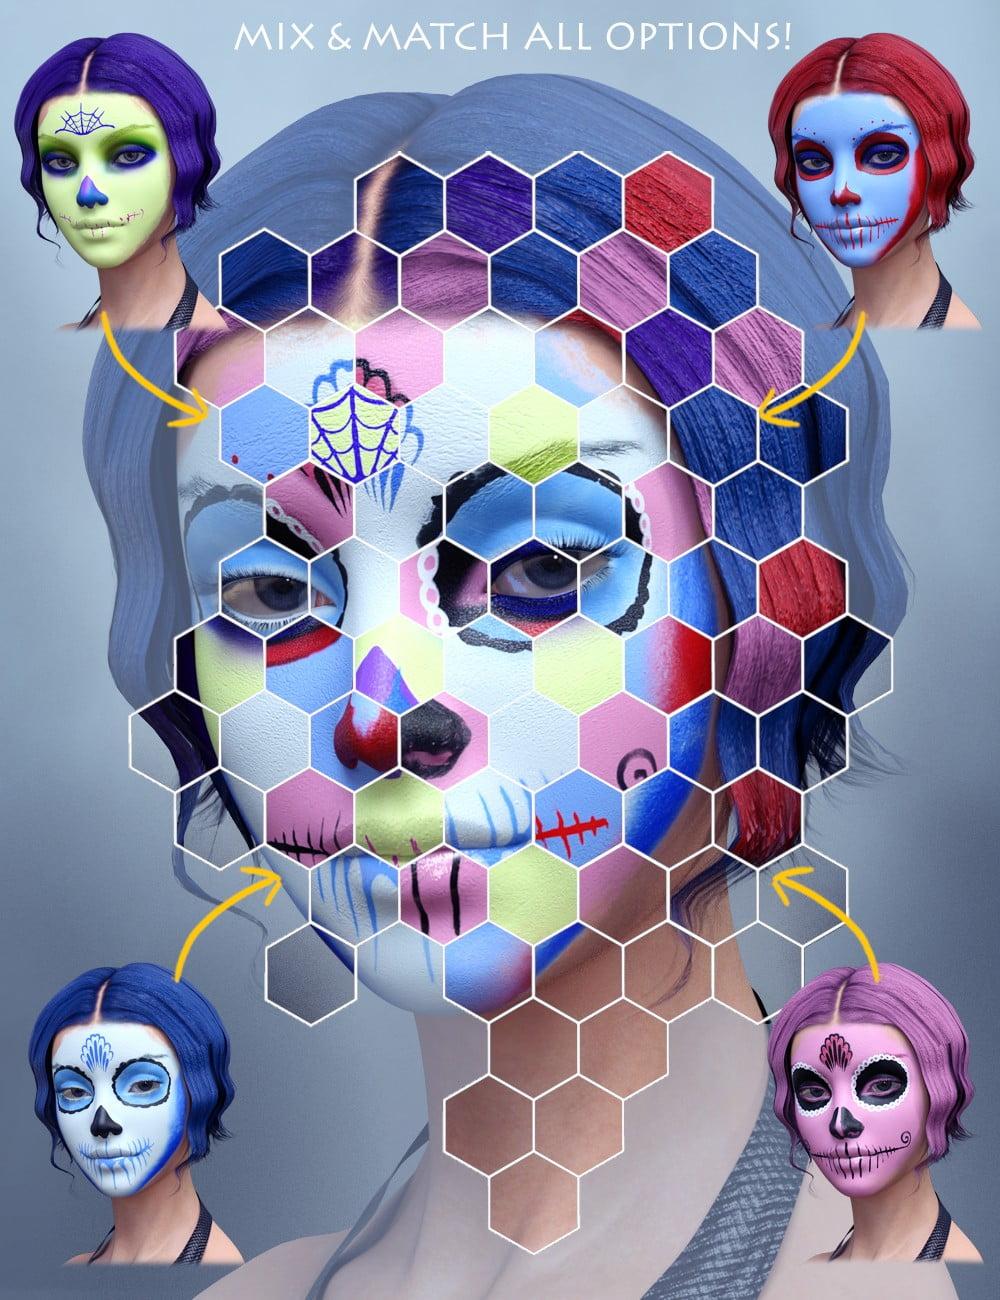 00-main-sugar-skull-make-up-for-genesis-3-female-daz3d